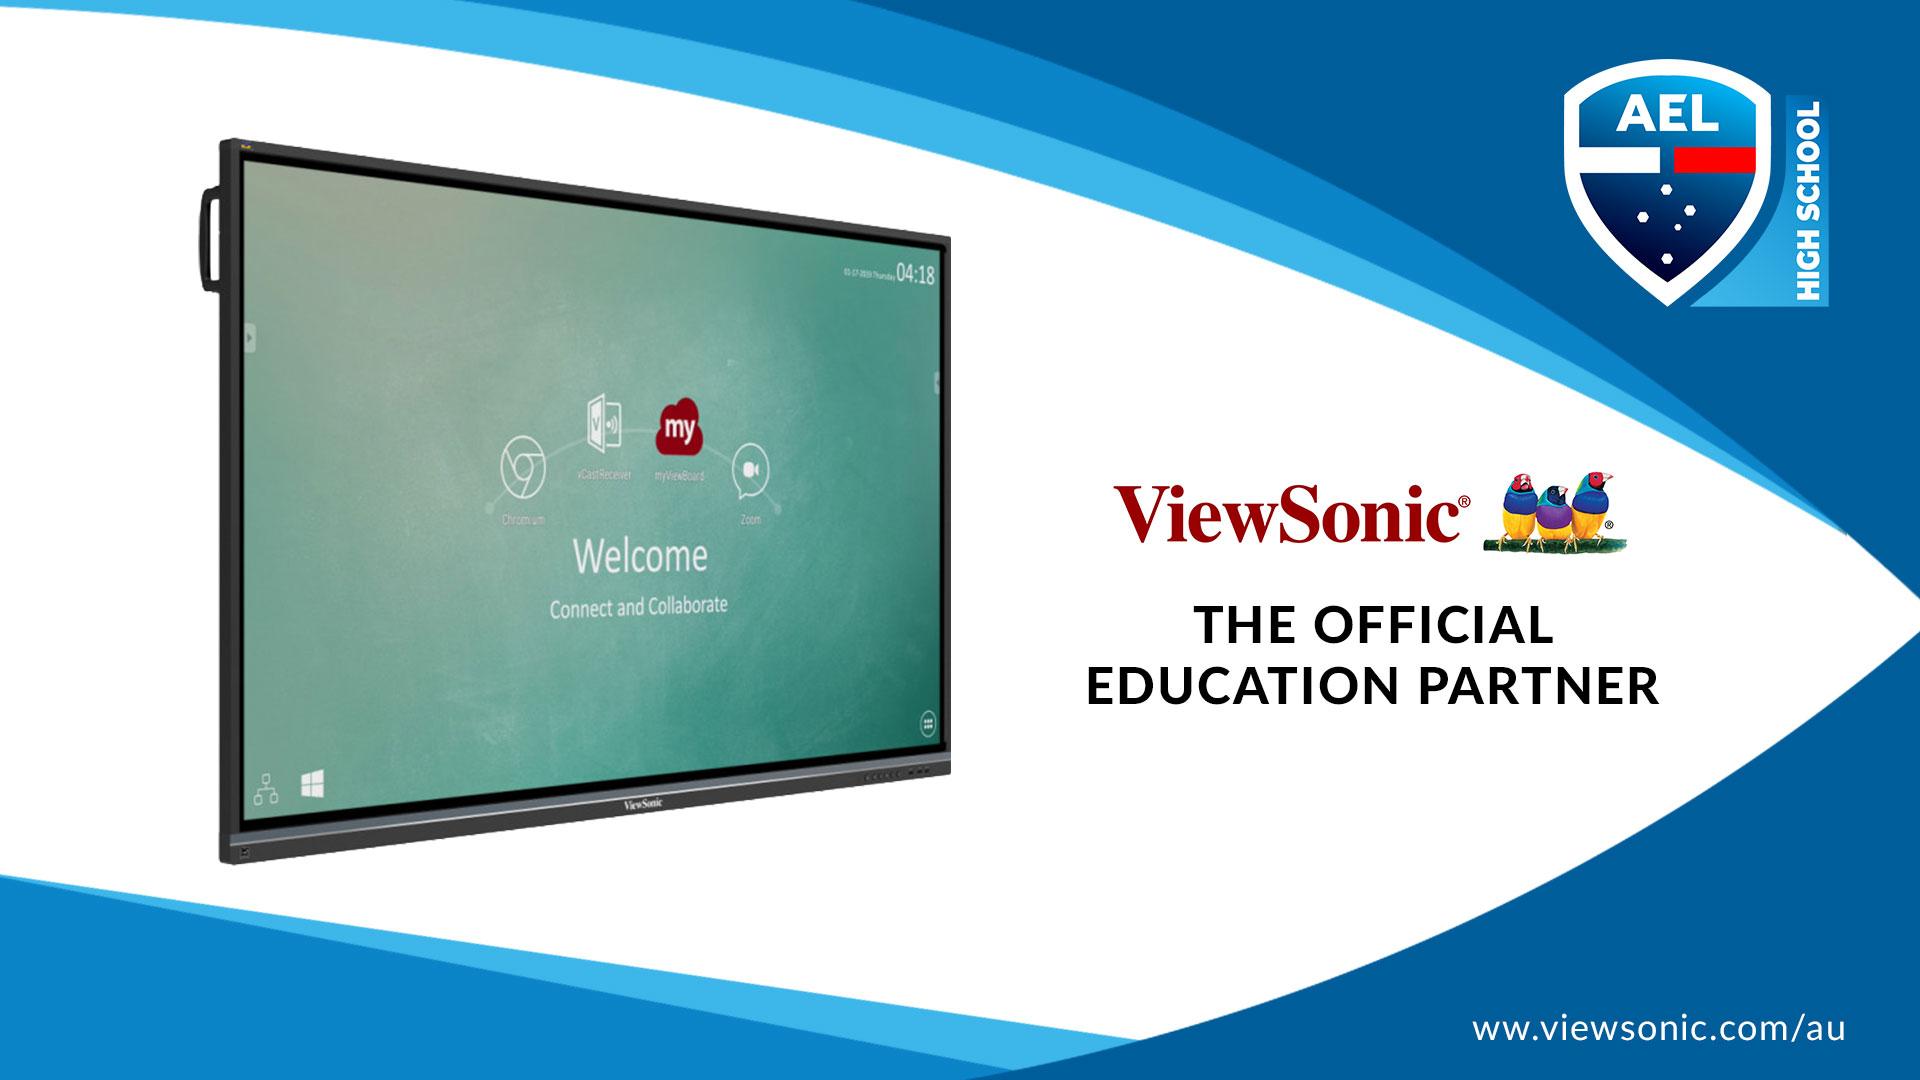 ViewSonic supports High School esports with Australian Esports League partnership